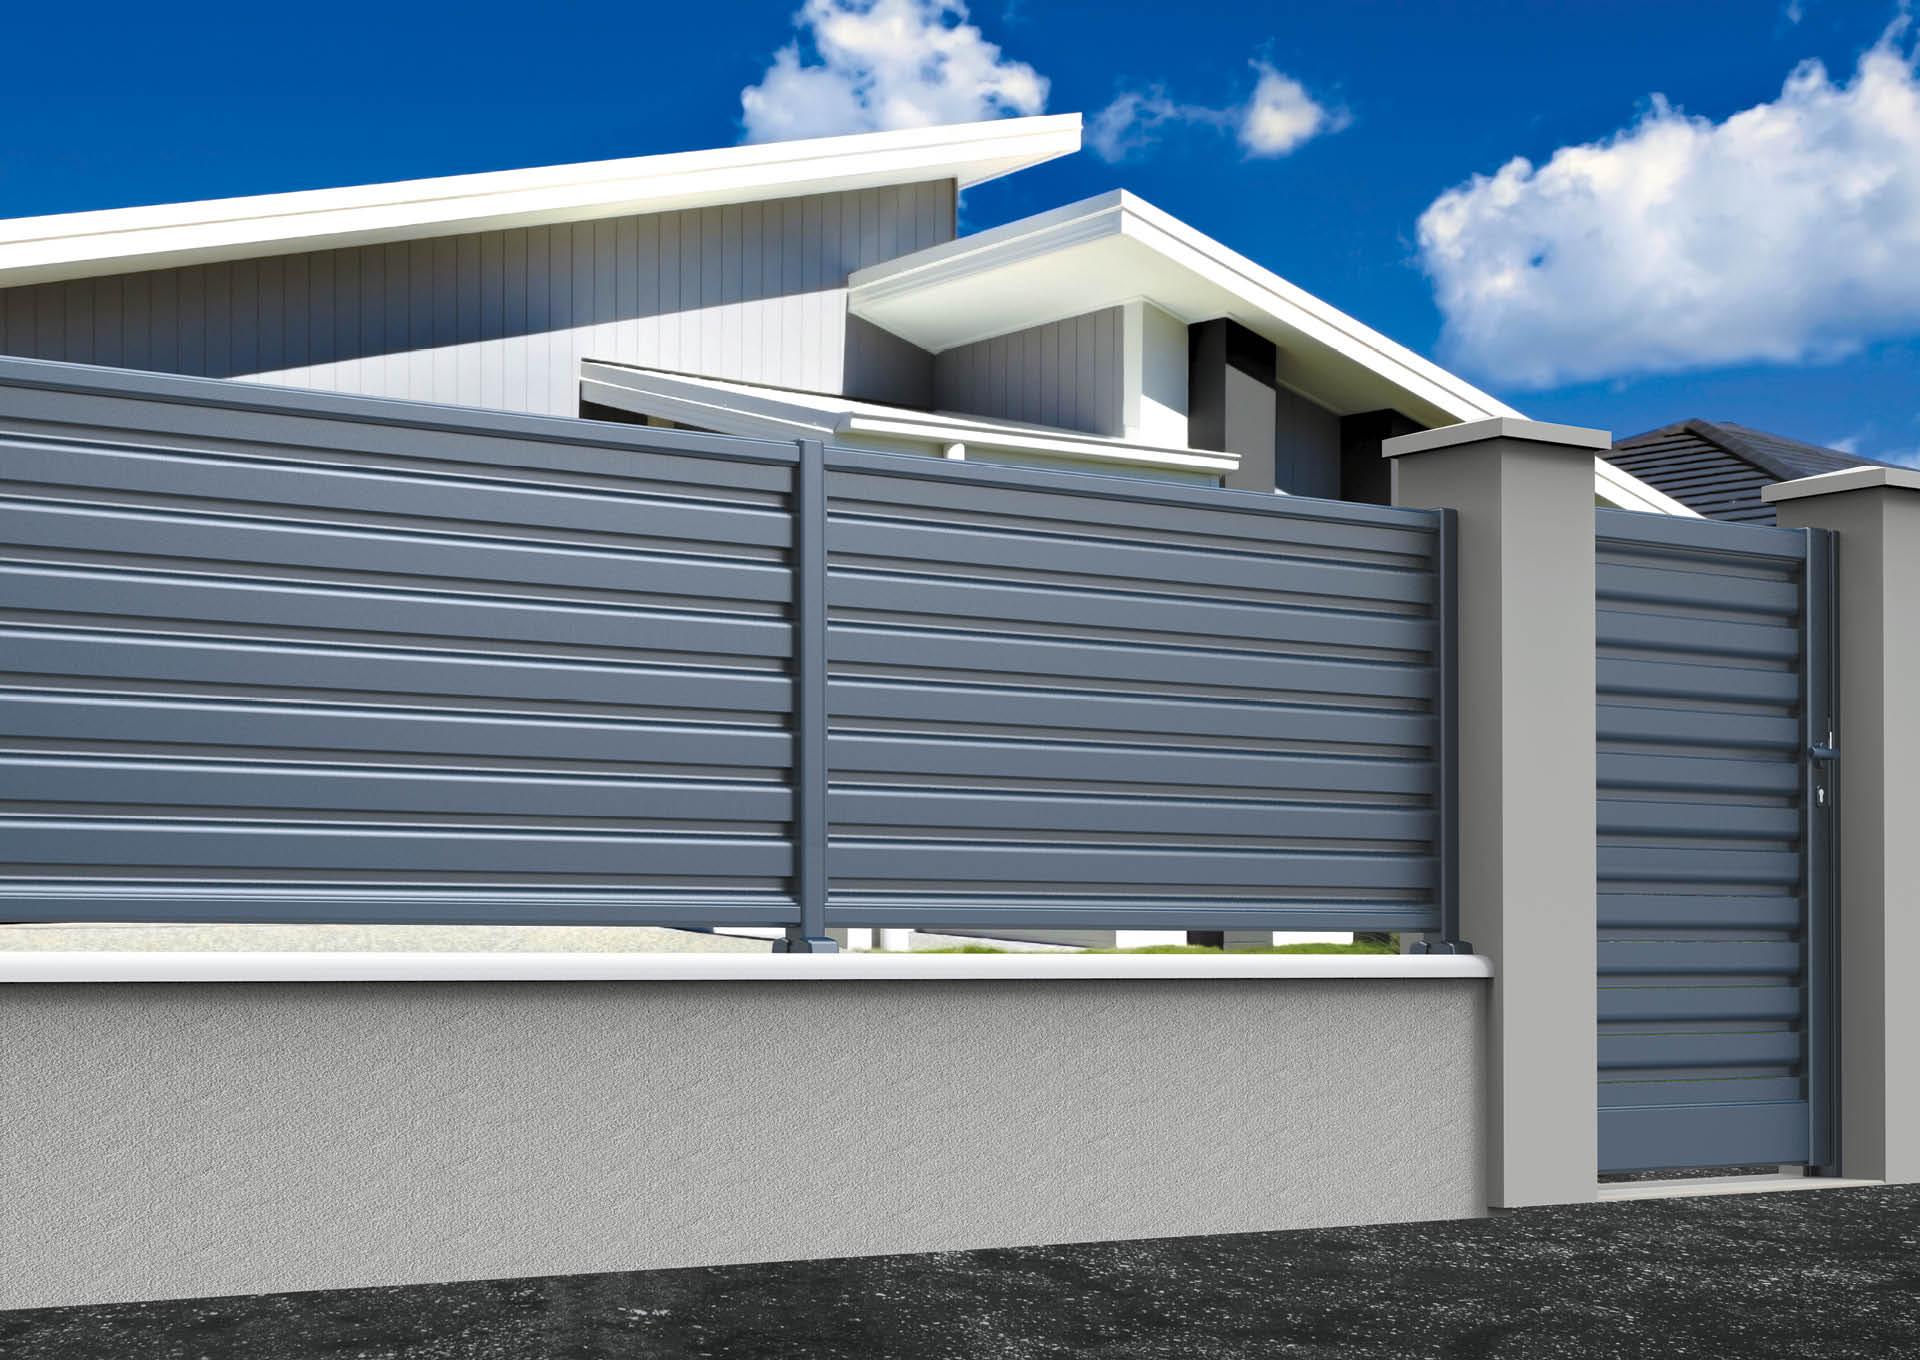 Clôtures aluminium lames vent